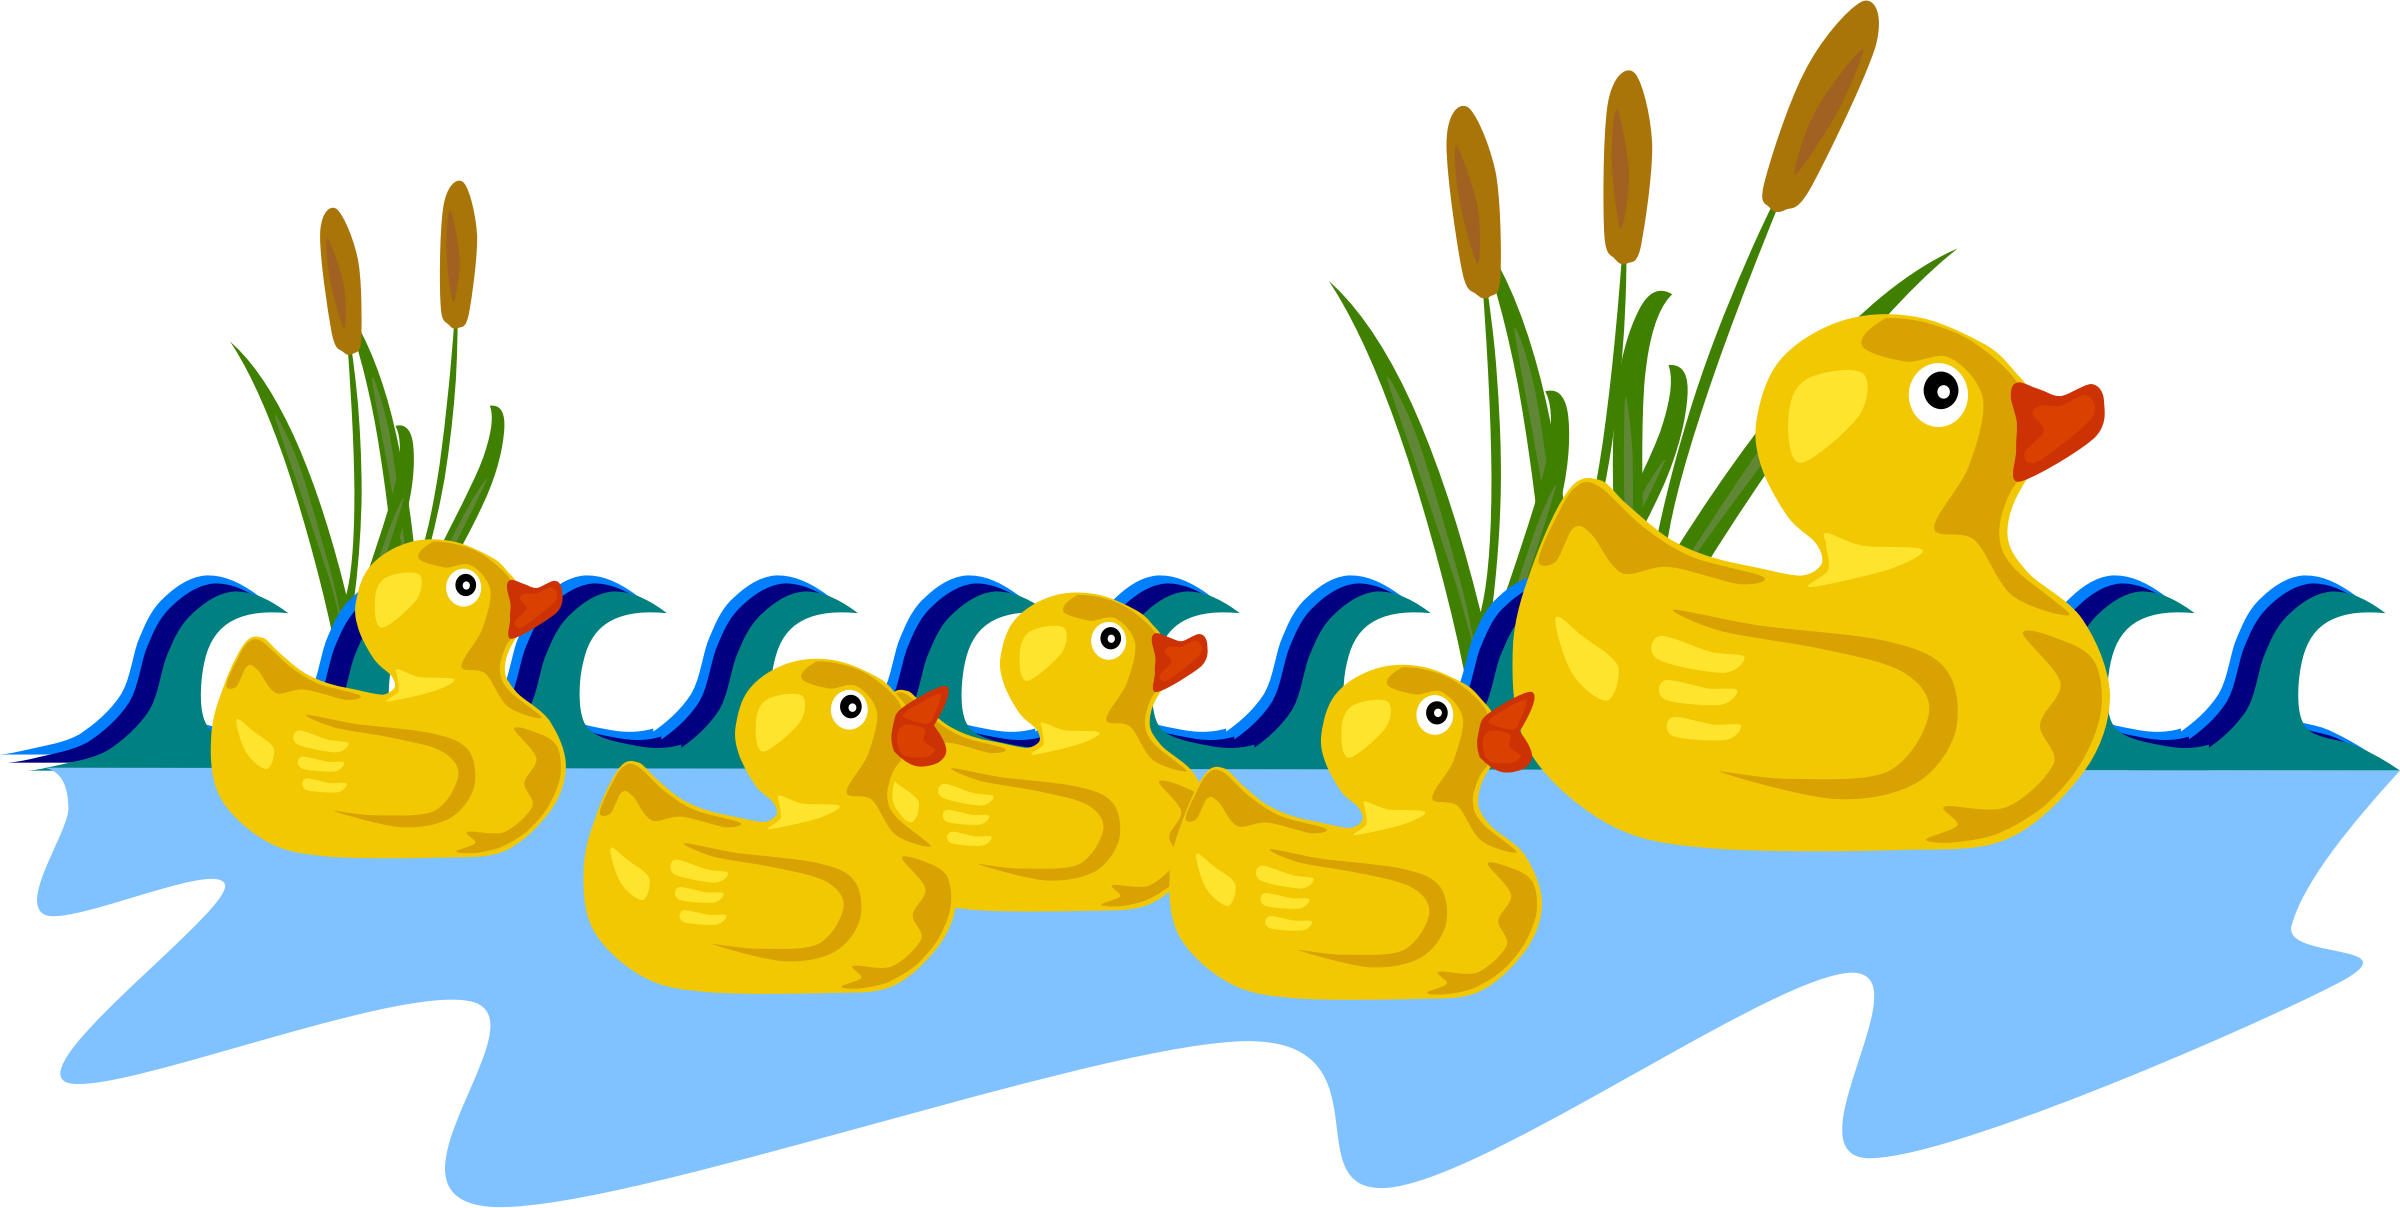 Swimsuit clipart clip art. Duckling bath duck pencil